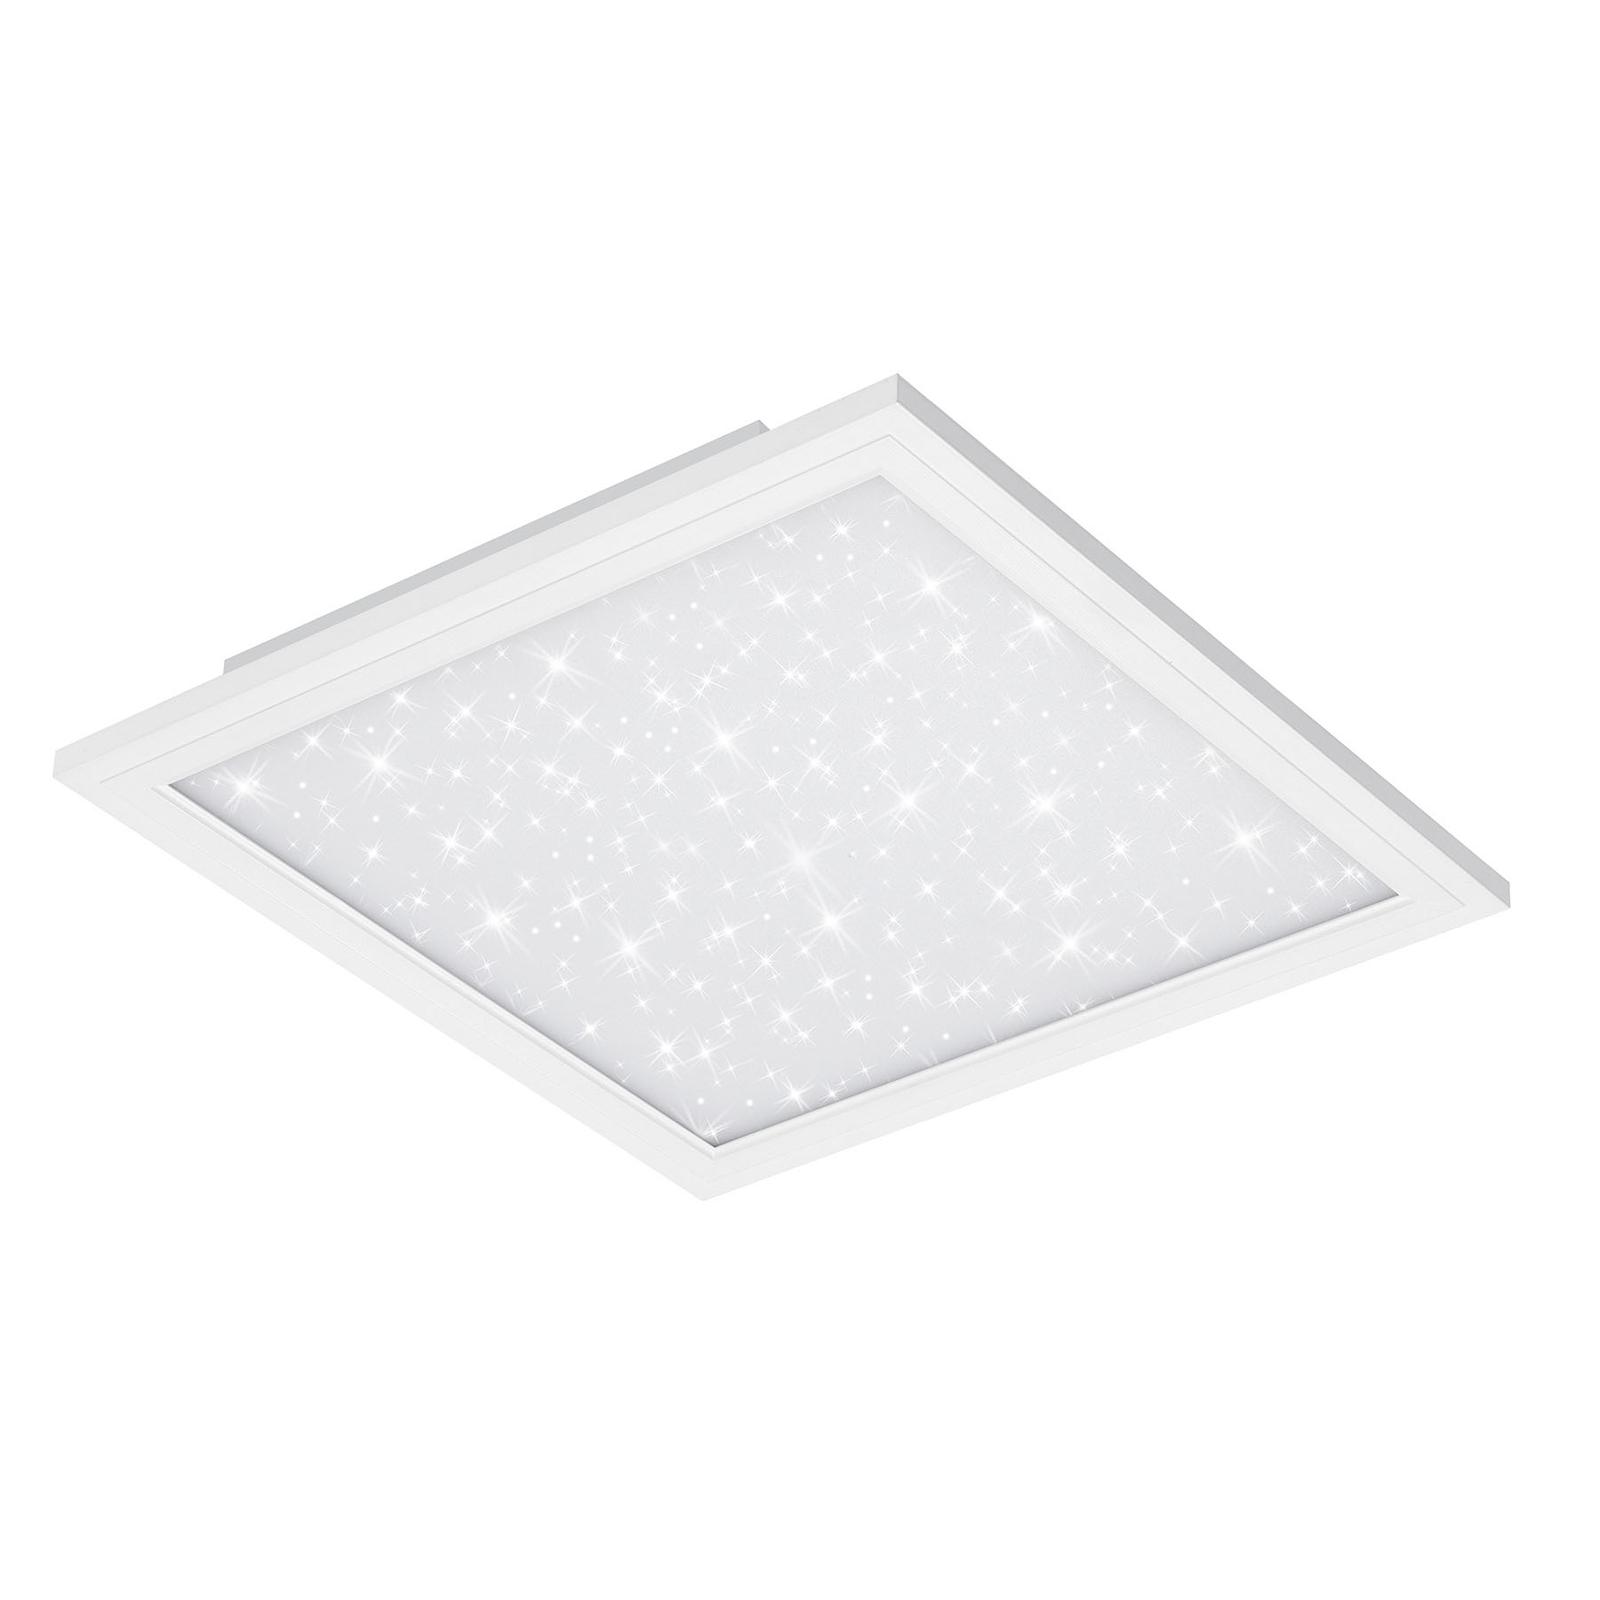 LED-Panel Sternenhimmel 7390, 29 x 29 cm